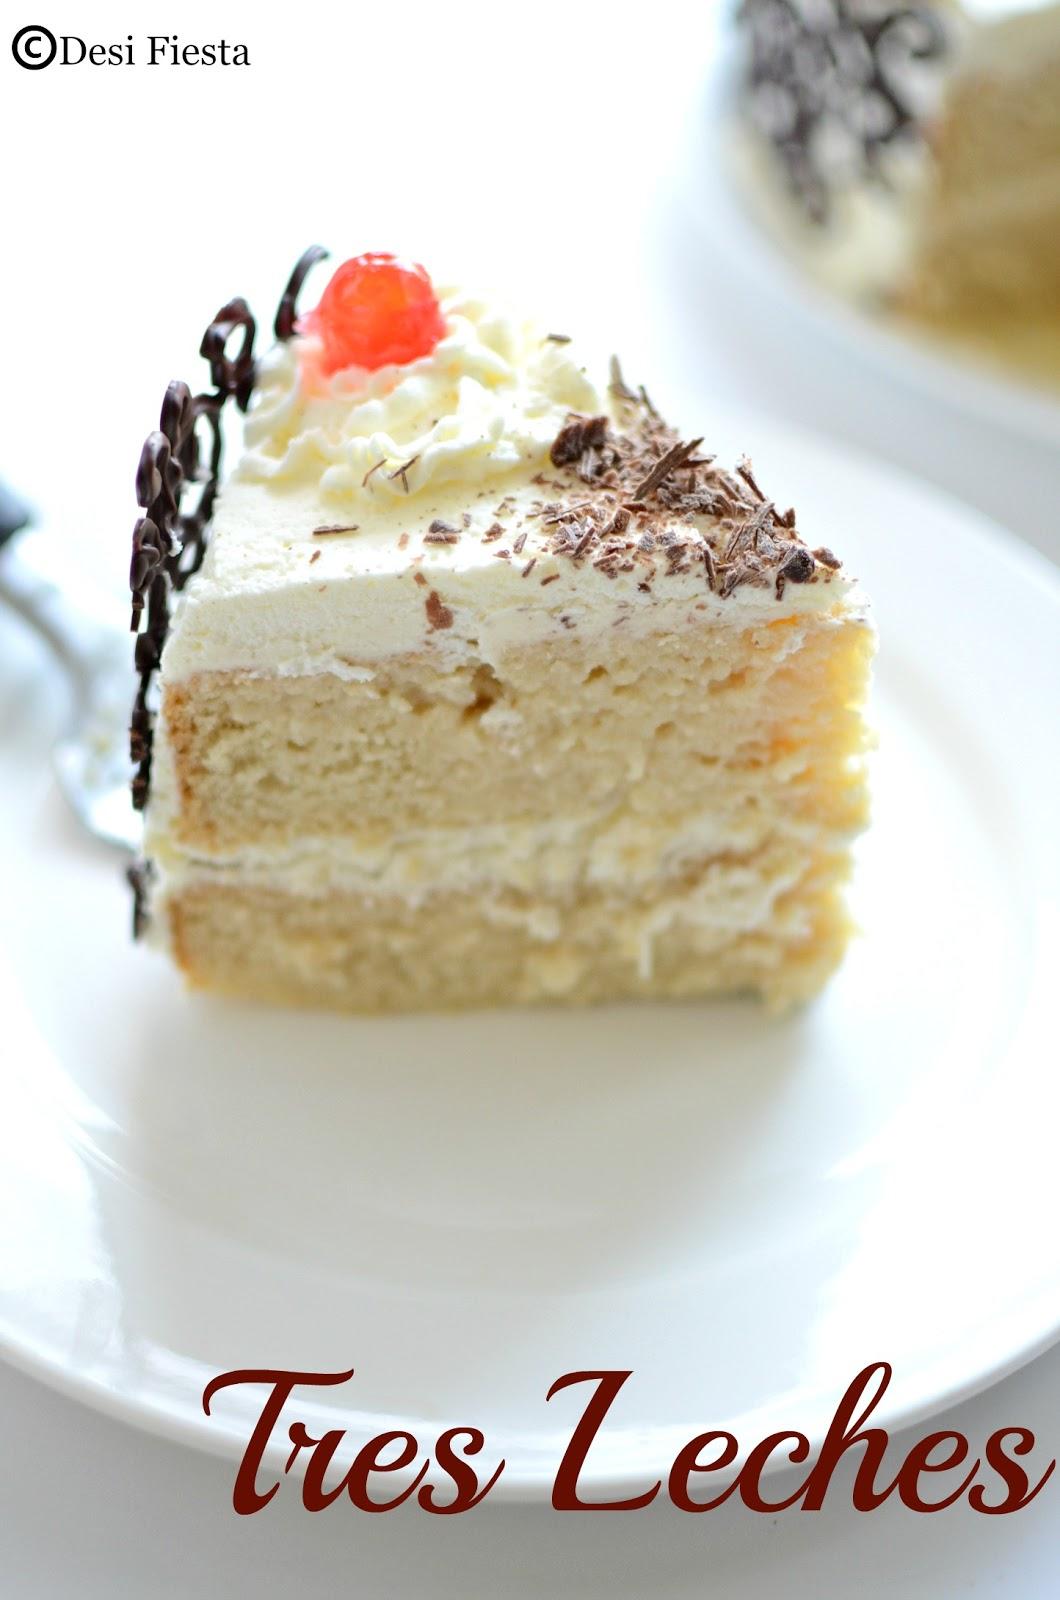 Eggless Chocolate Cake With Evaporated Milk